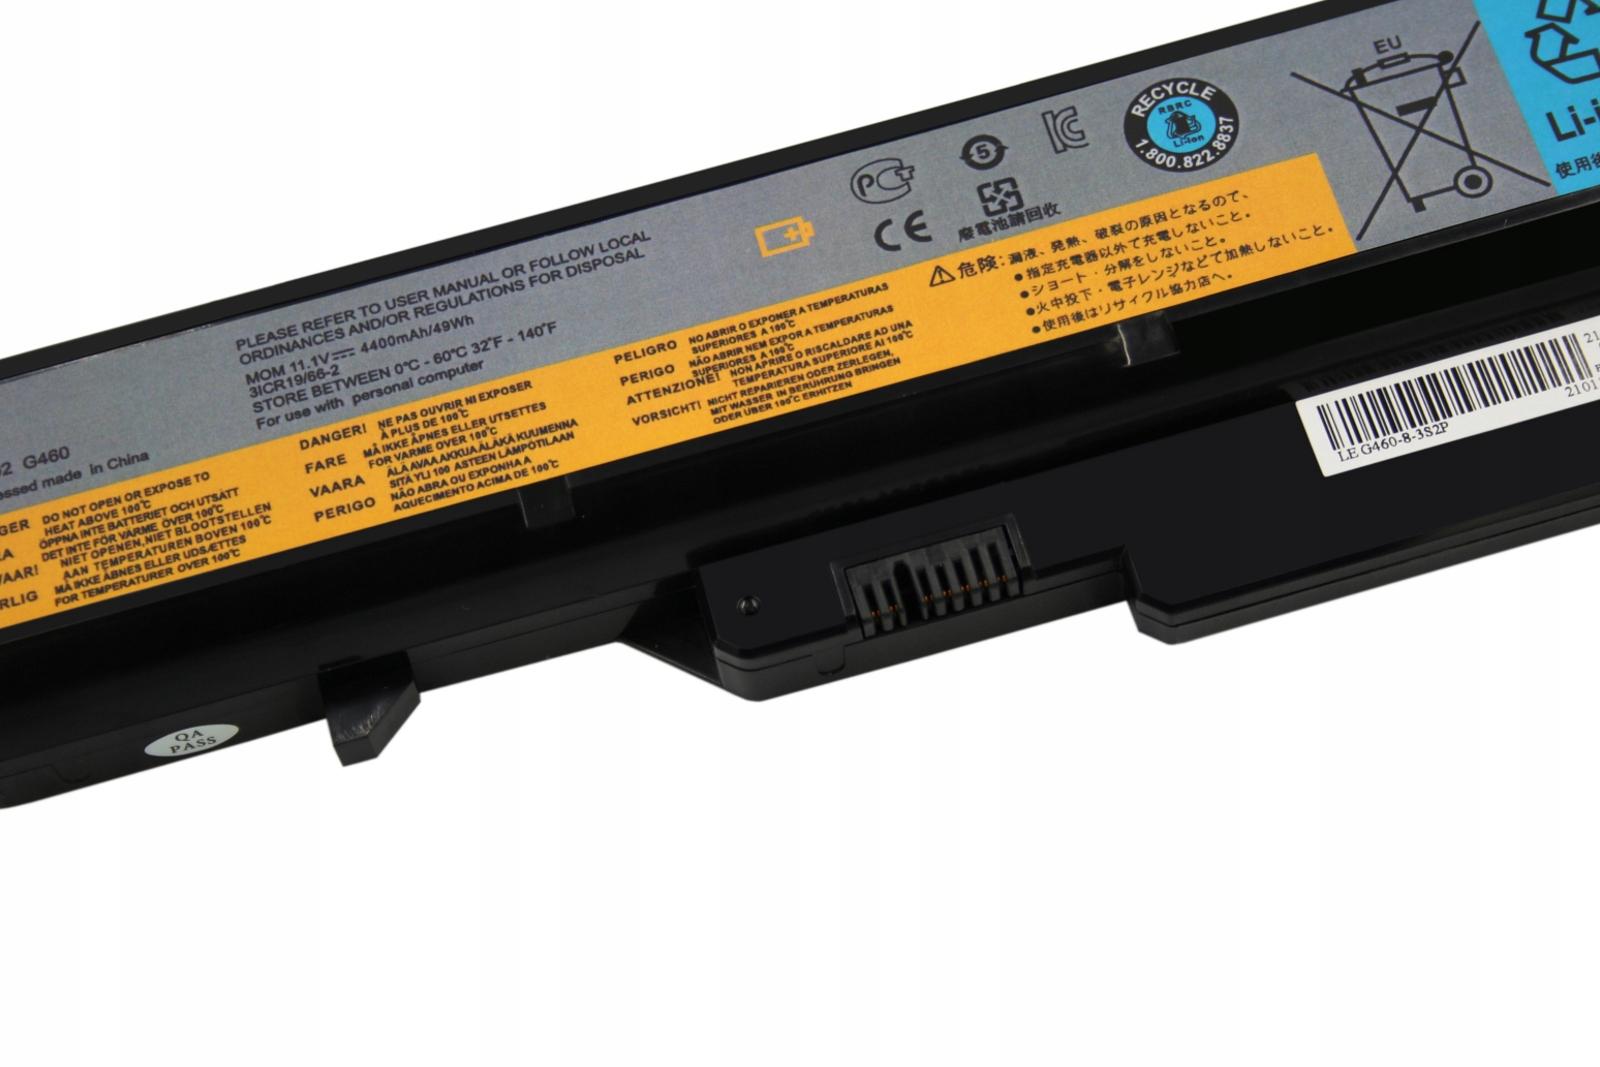 BATERIA AKUMULATOR LENOVO B570 G560 G570 G575 G770 Z560 Z570 - Baterie do laptopów